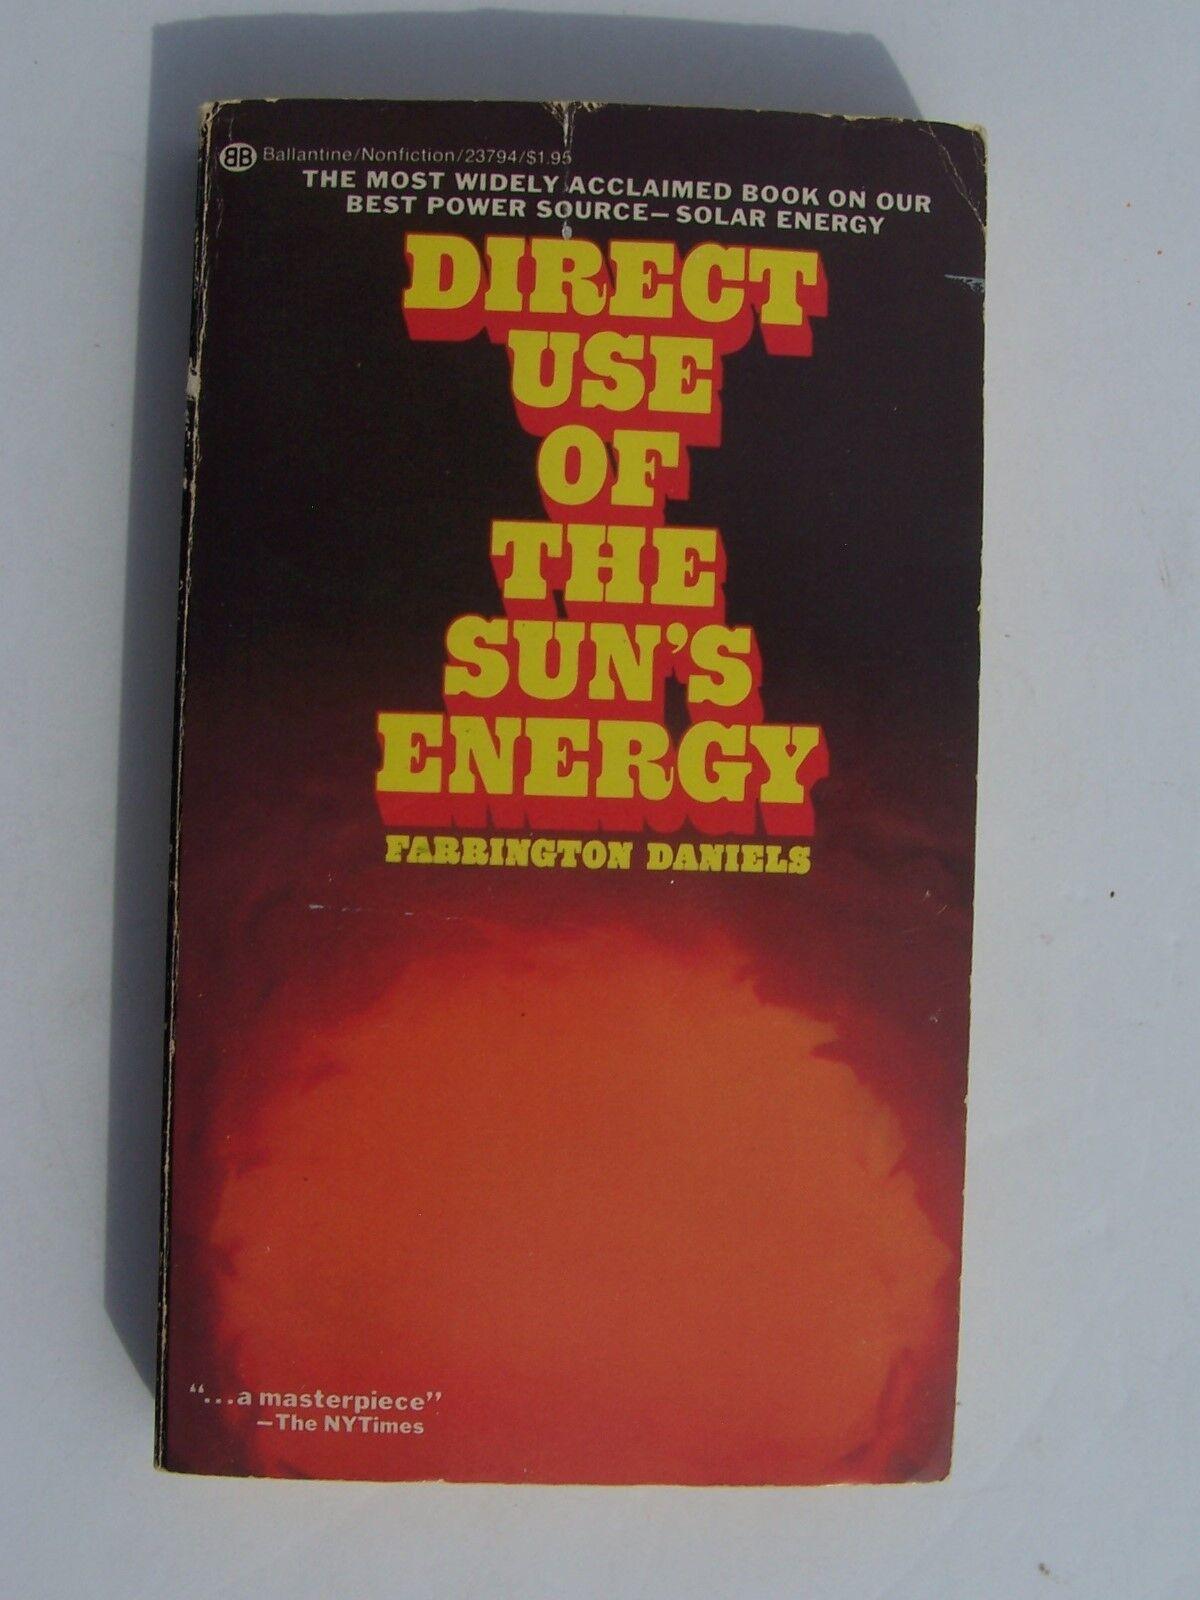 Direct Use of the Sun's Energy by Farrington Daniels (1